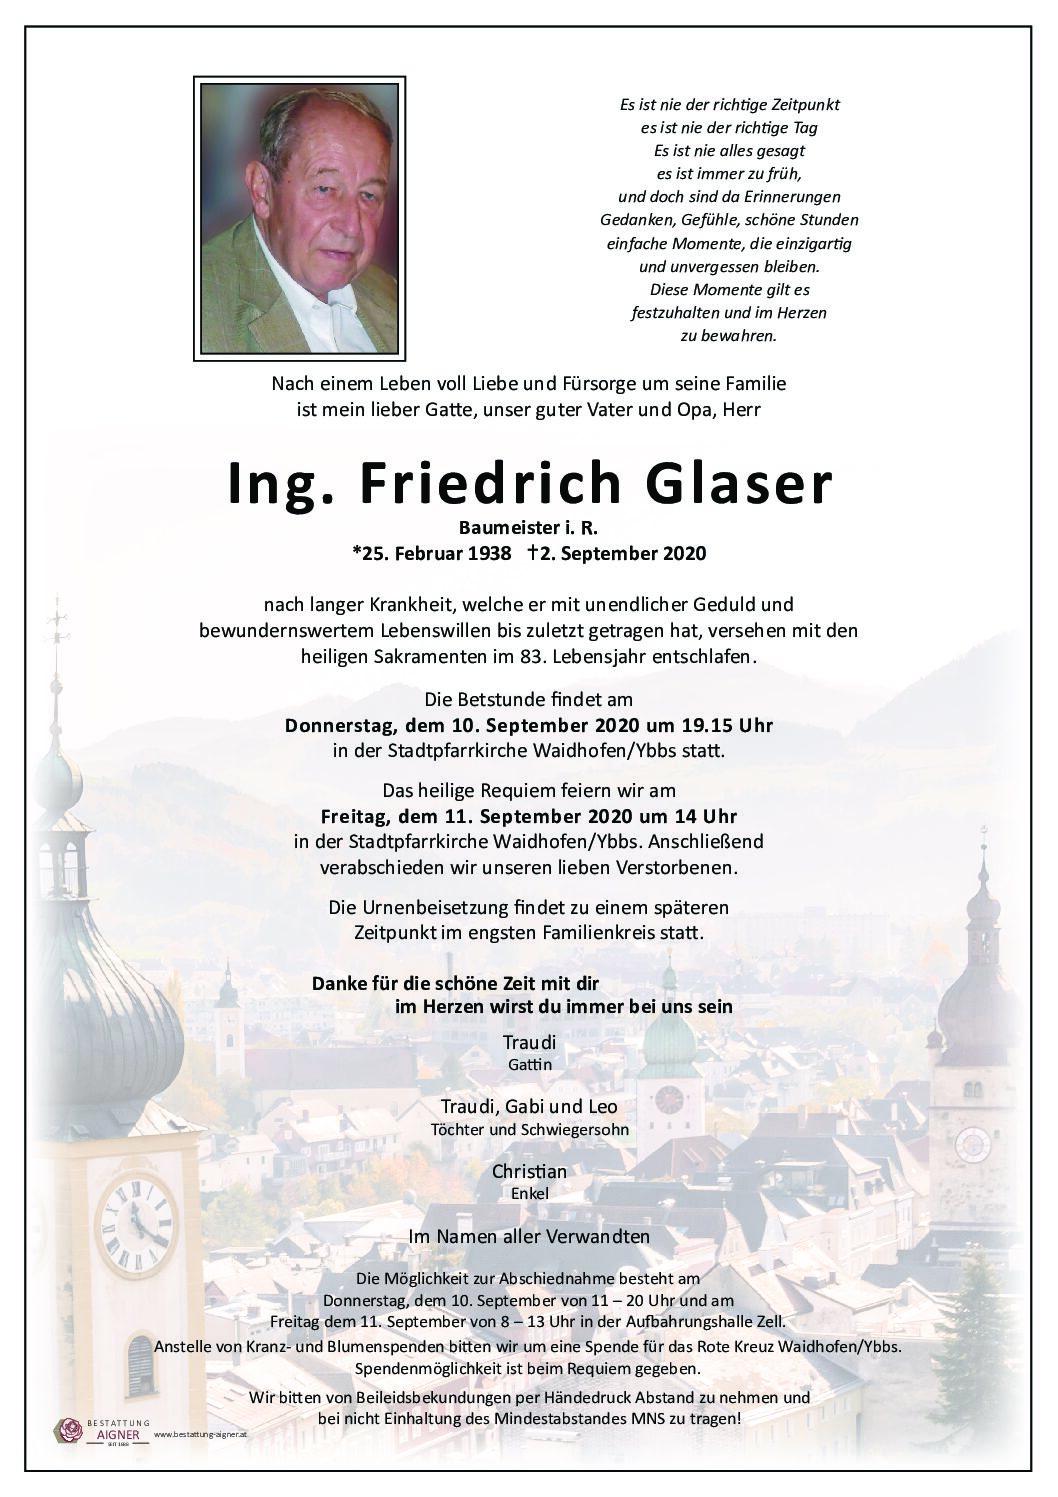 Ing. Friedrich Glaser